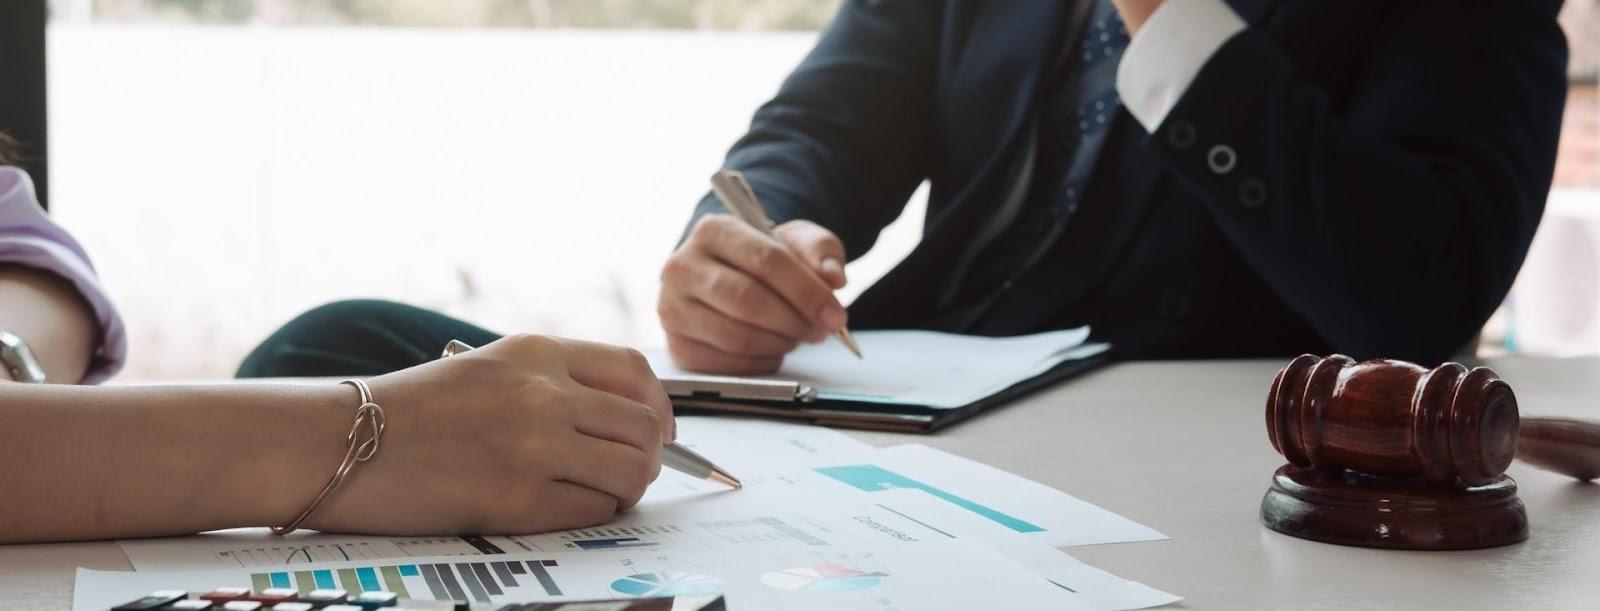 Why Study Tax Law?